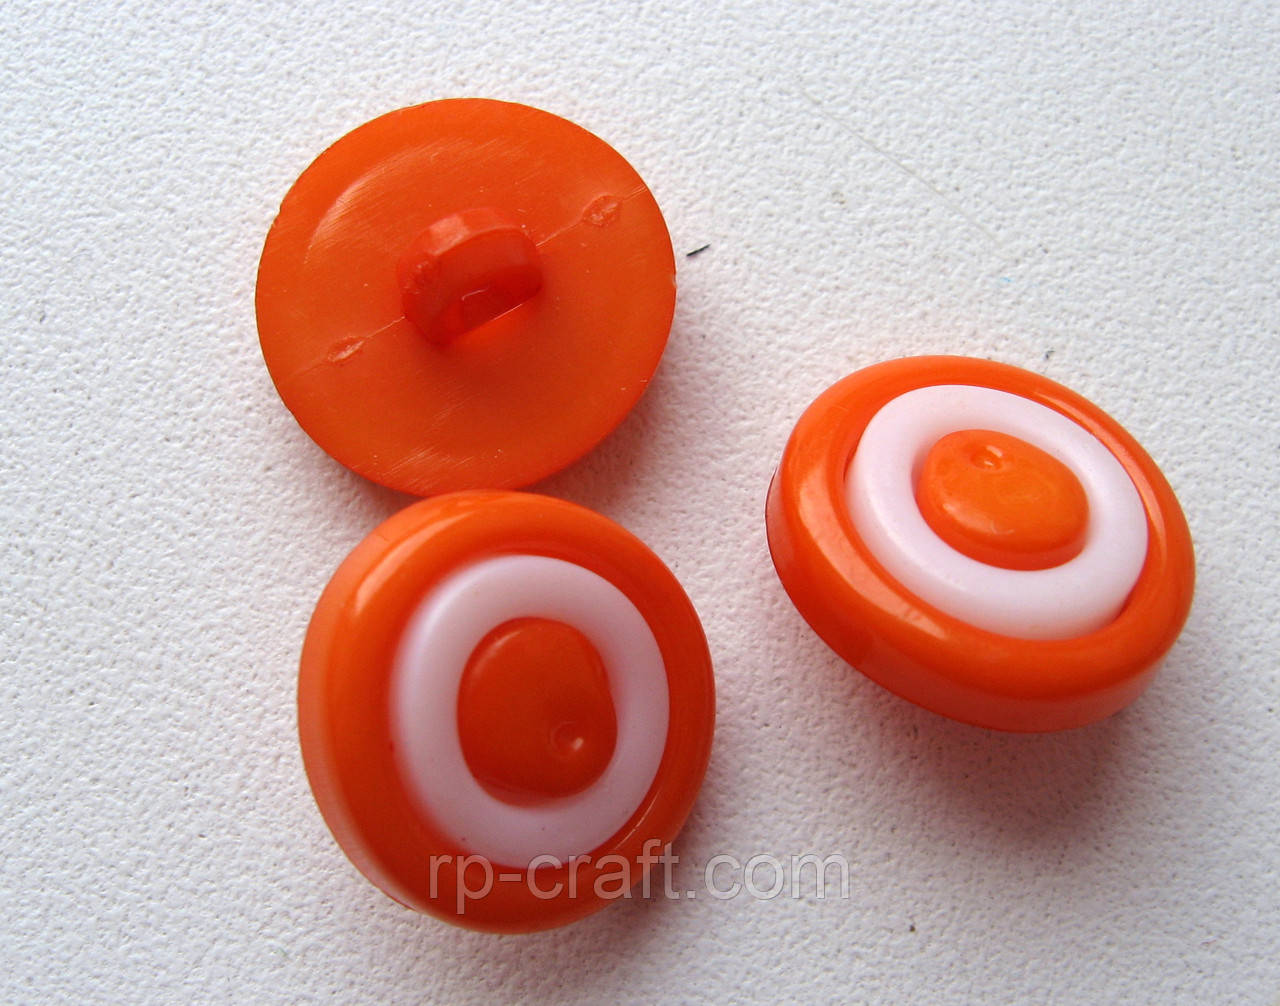 Пуговица пластиковая, оранжевая, на ножке, 15 мм.